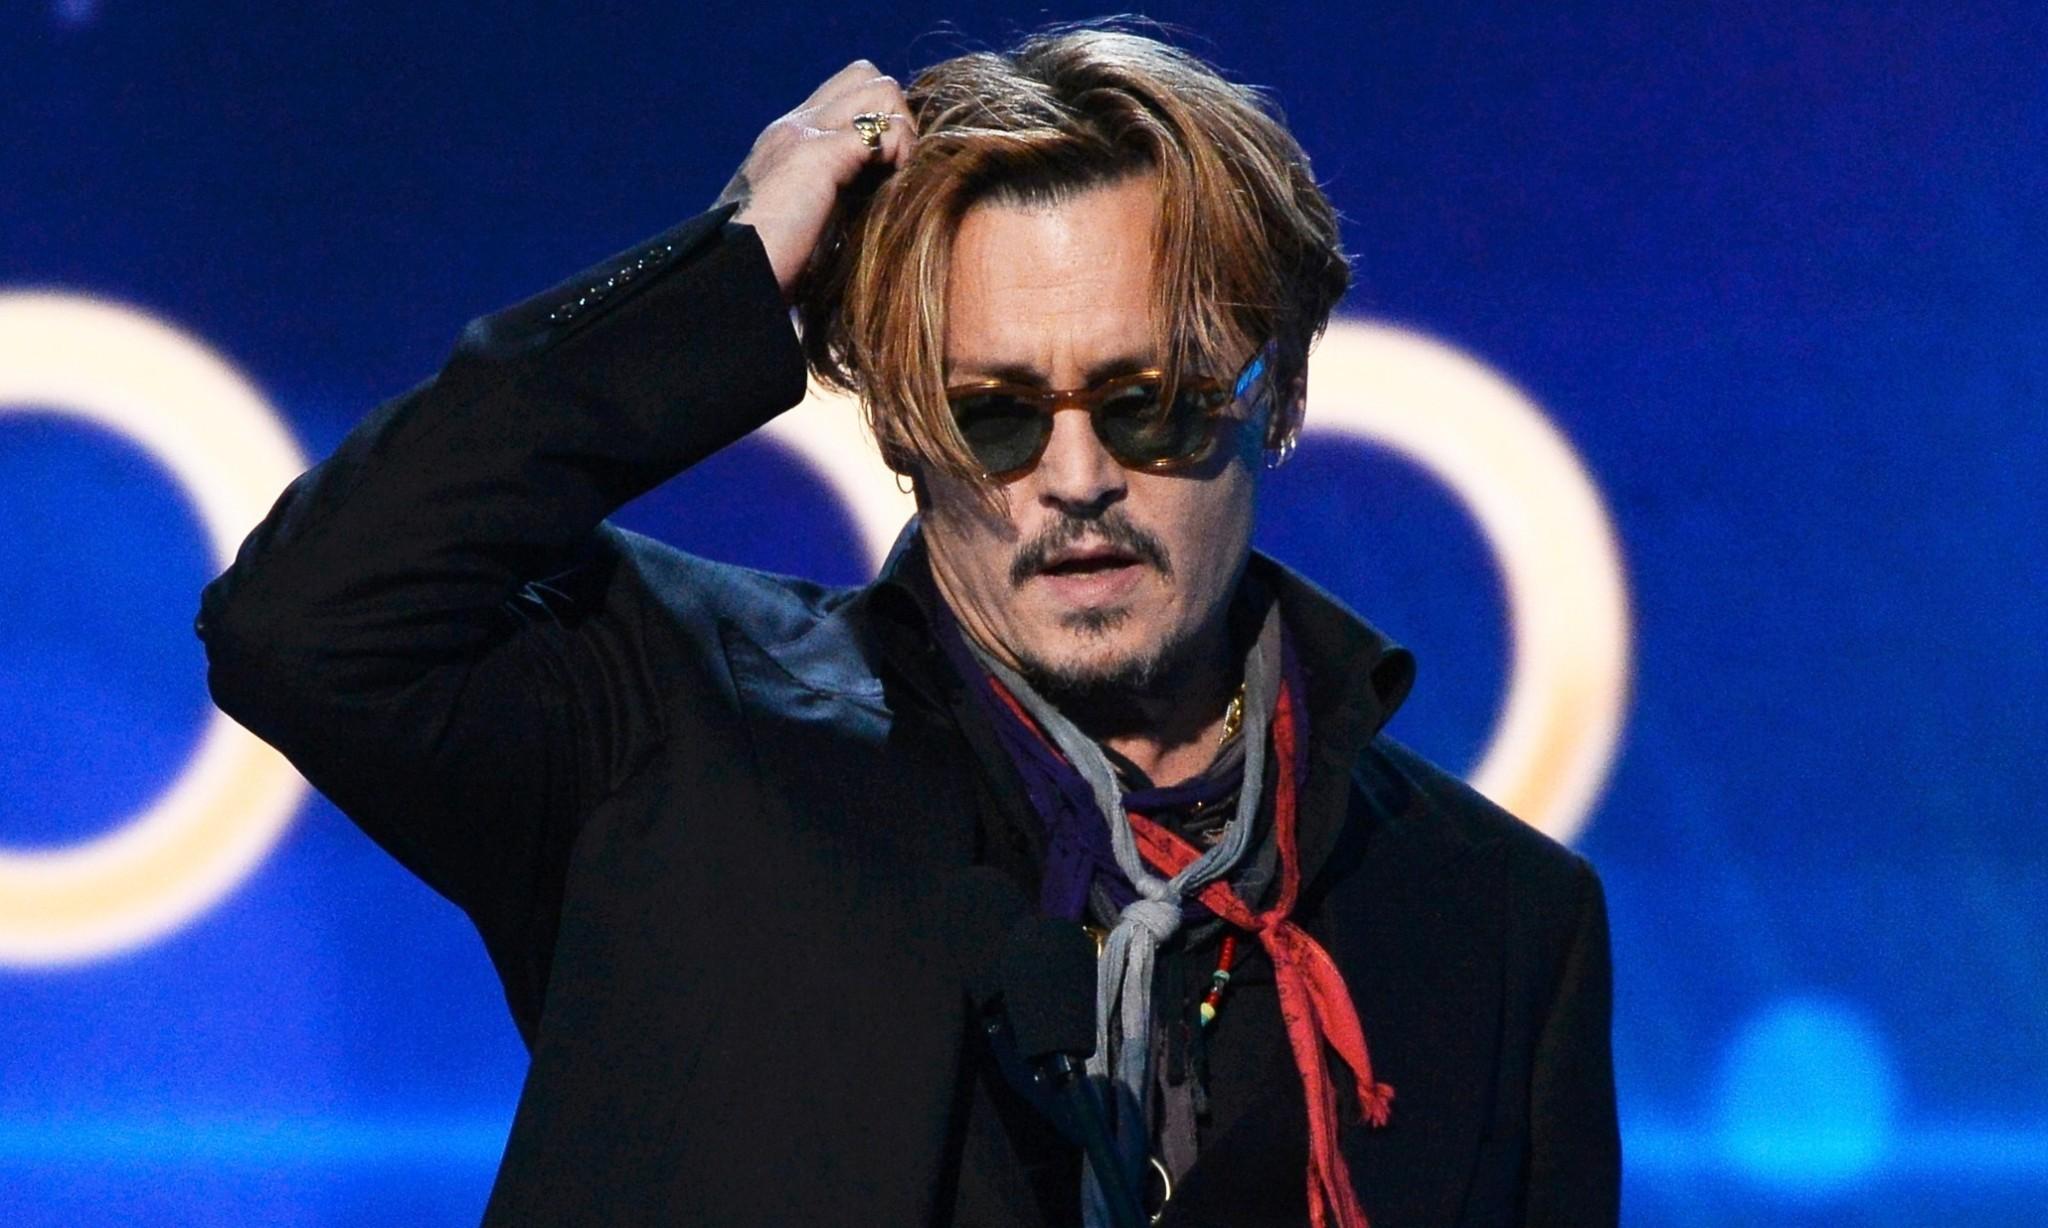 Apparently drunk Johnny Depp cut off at Hollywood Film Awards ceremony